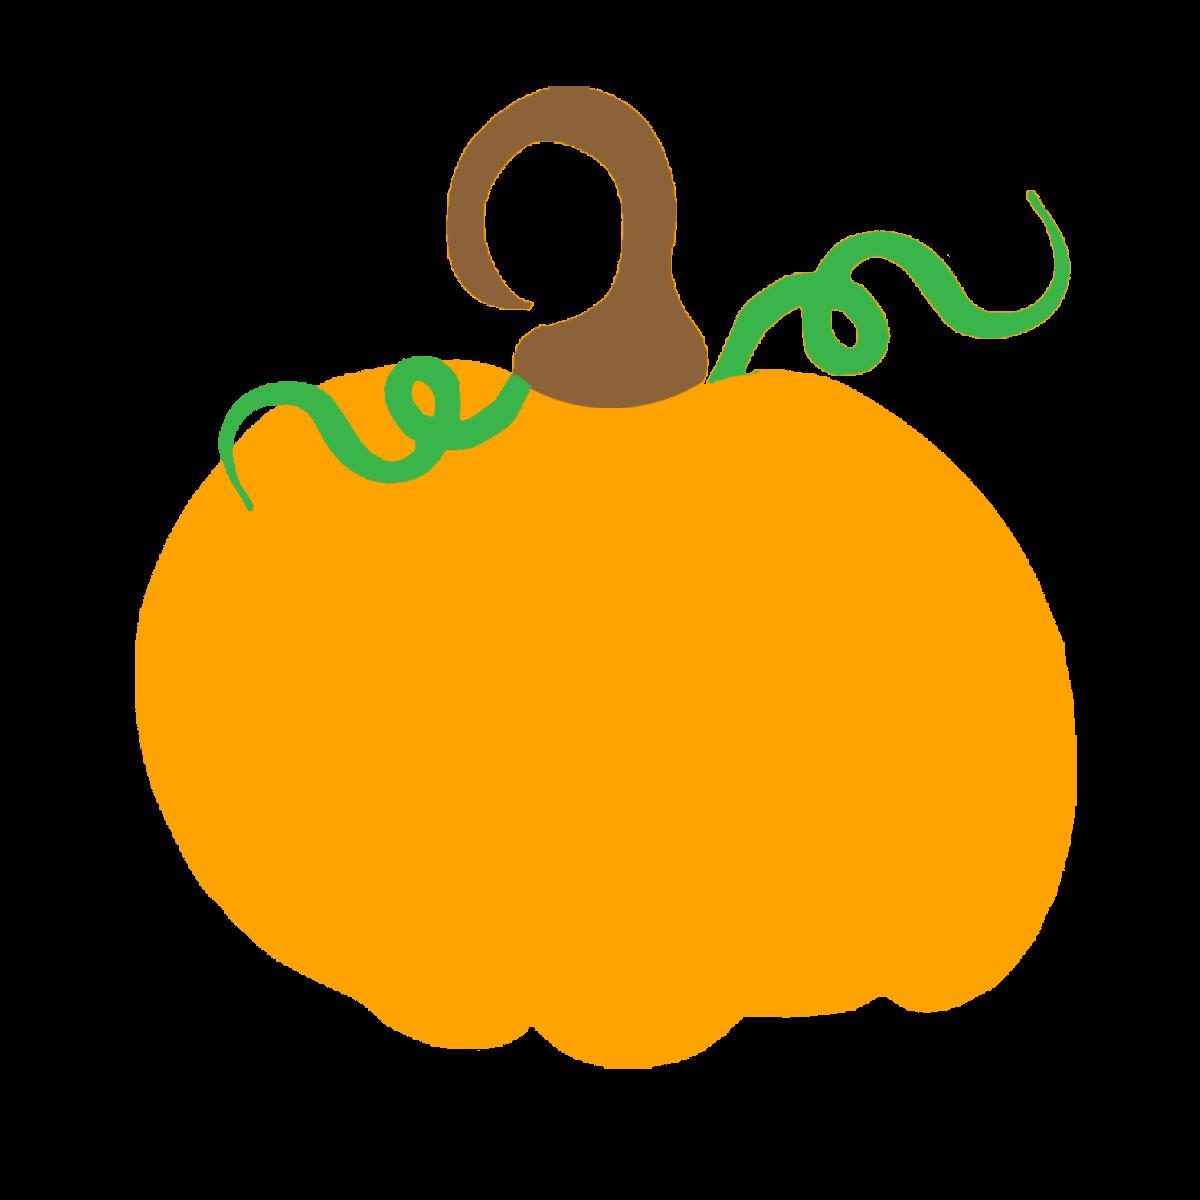 Baby pumpkin clipart clipart free stock Pumpkin Cliparts - Cliparts Zone clipart free stock